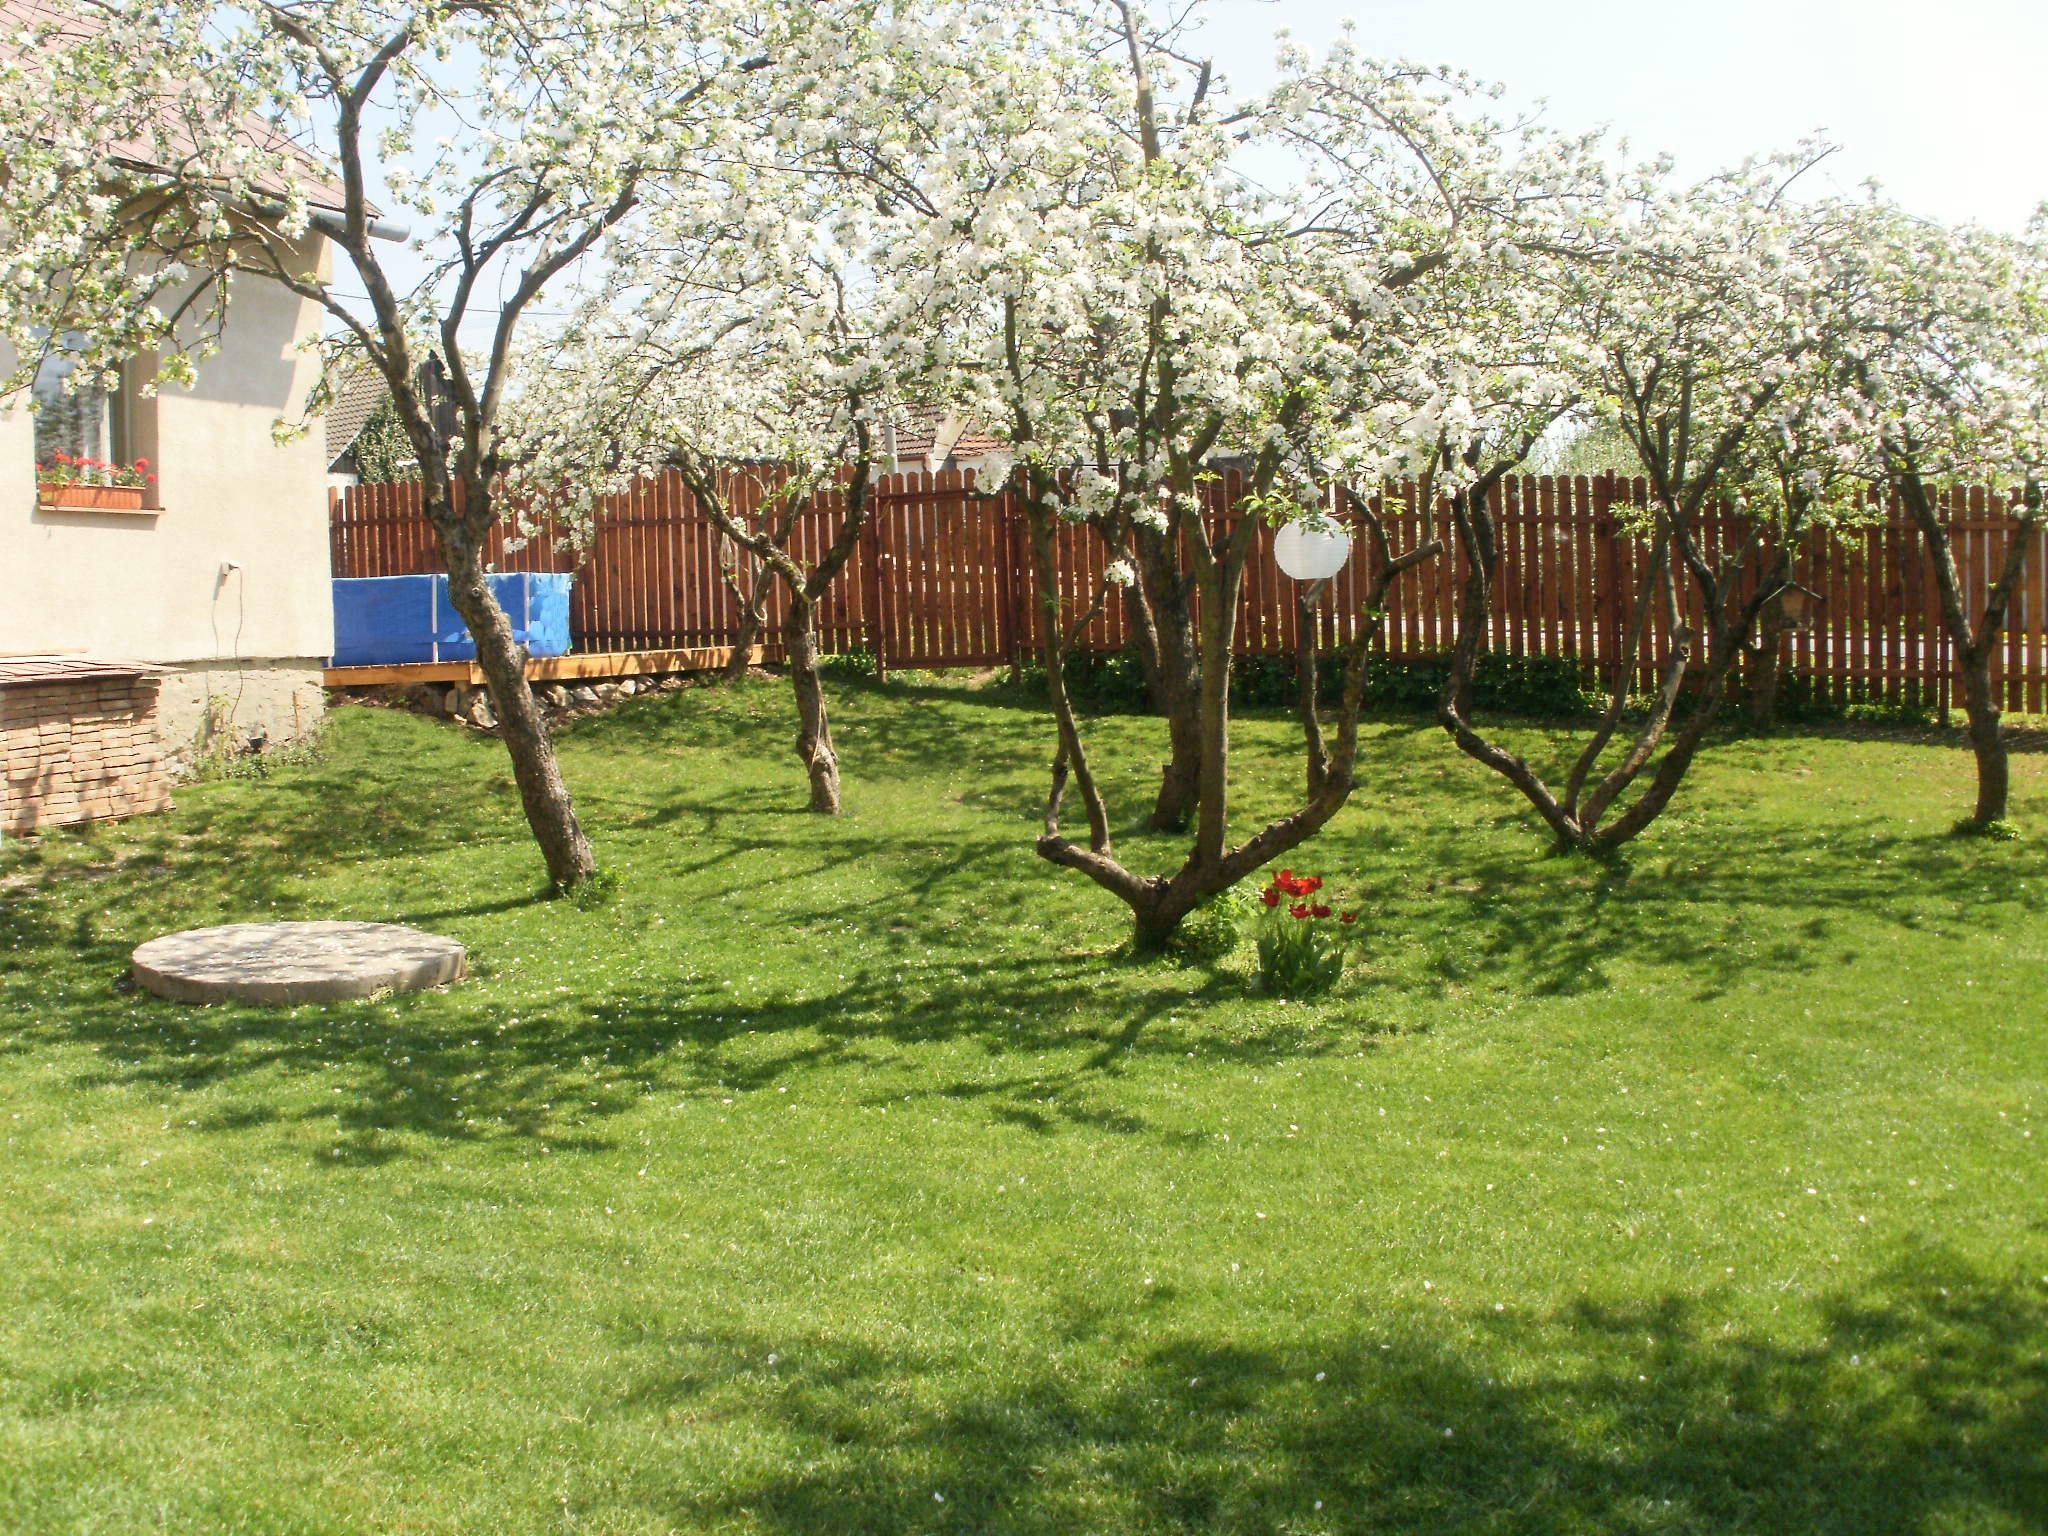 Zahrada s jabloněmi